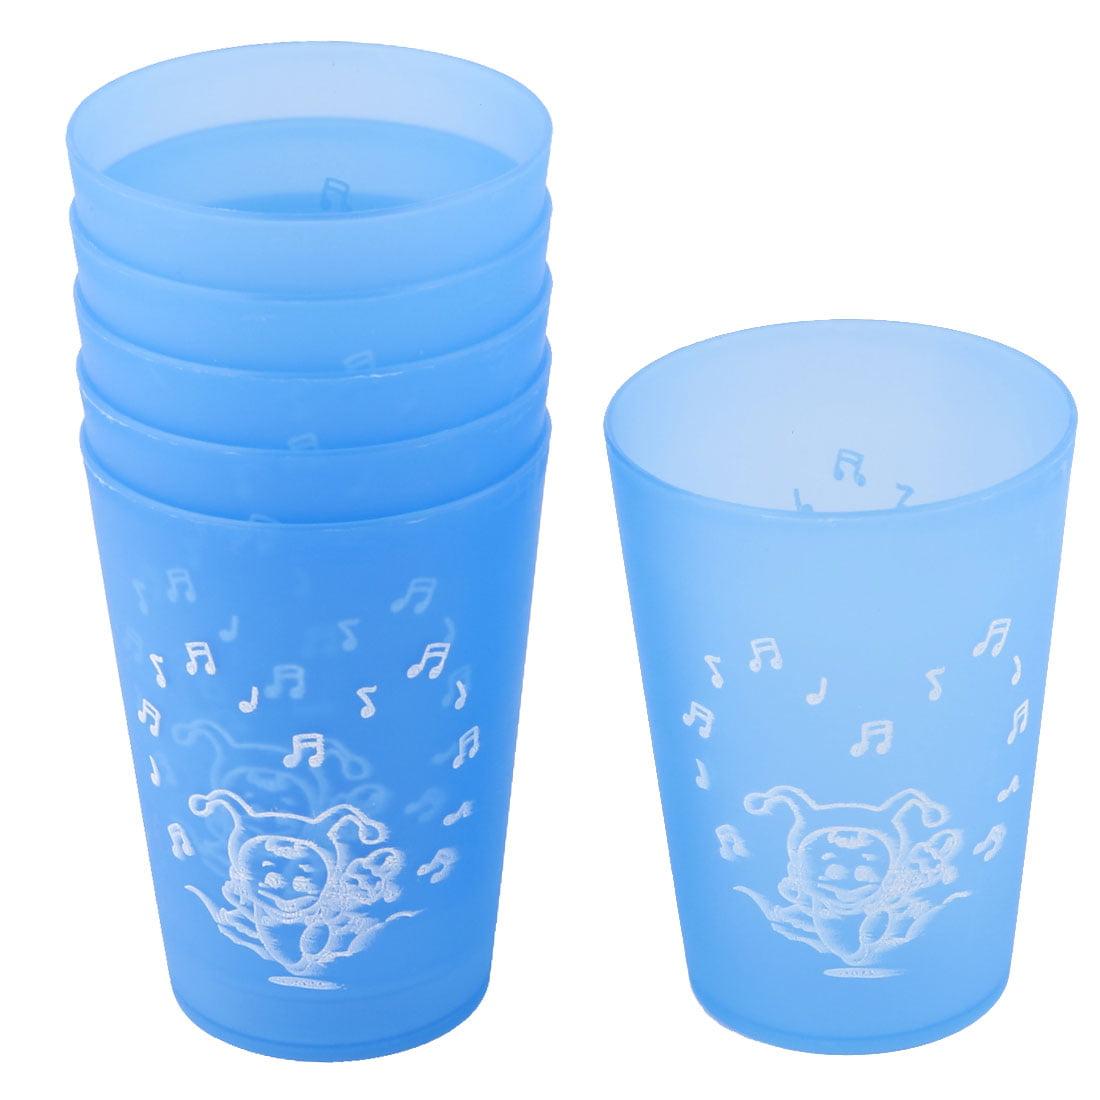 Unique BargainsHome Office Plastic Heart Musical Note Pattern Water Milk Drinking Cup Blue 6pcs by Unique-Bargains